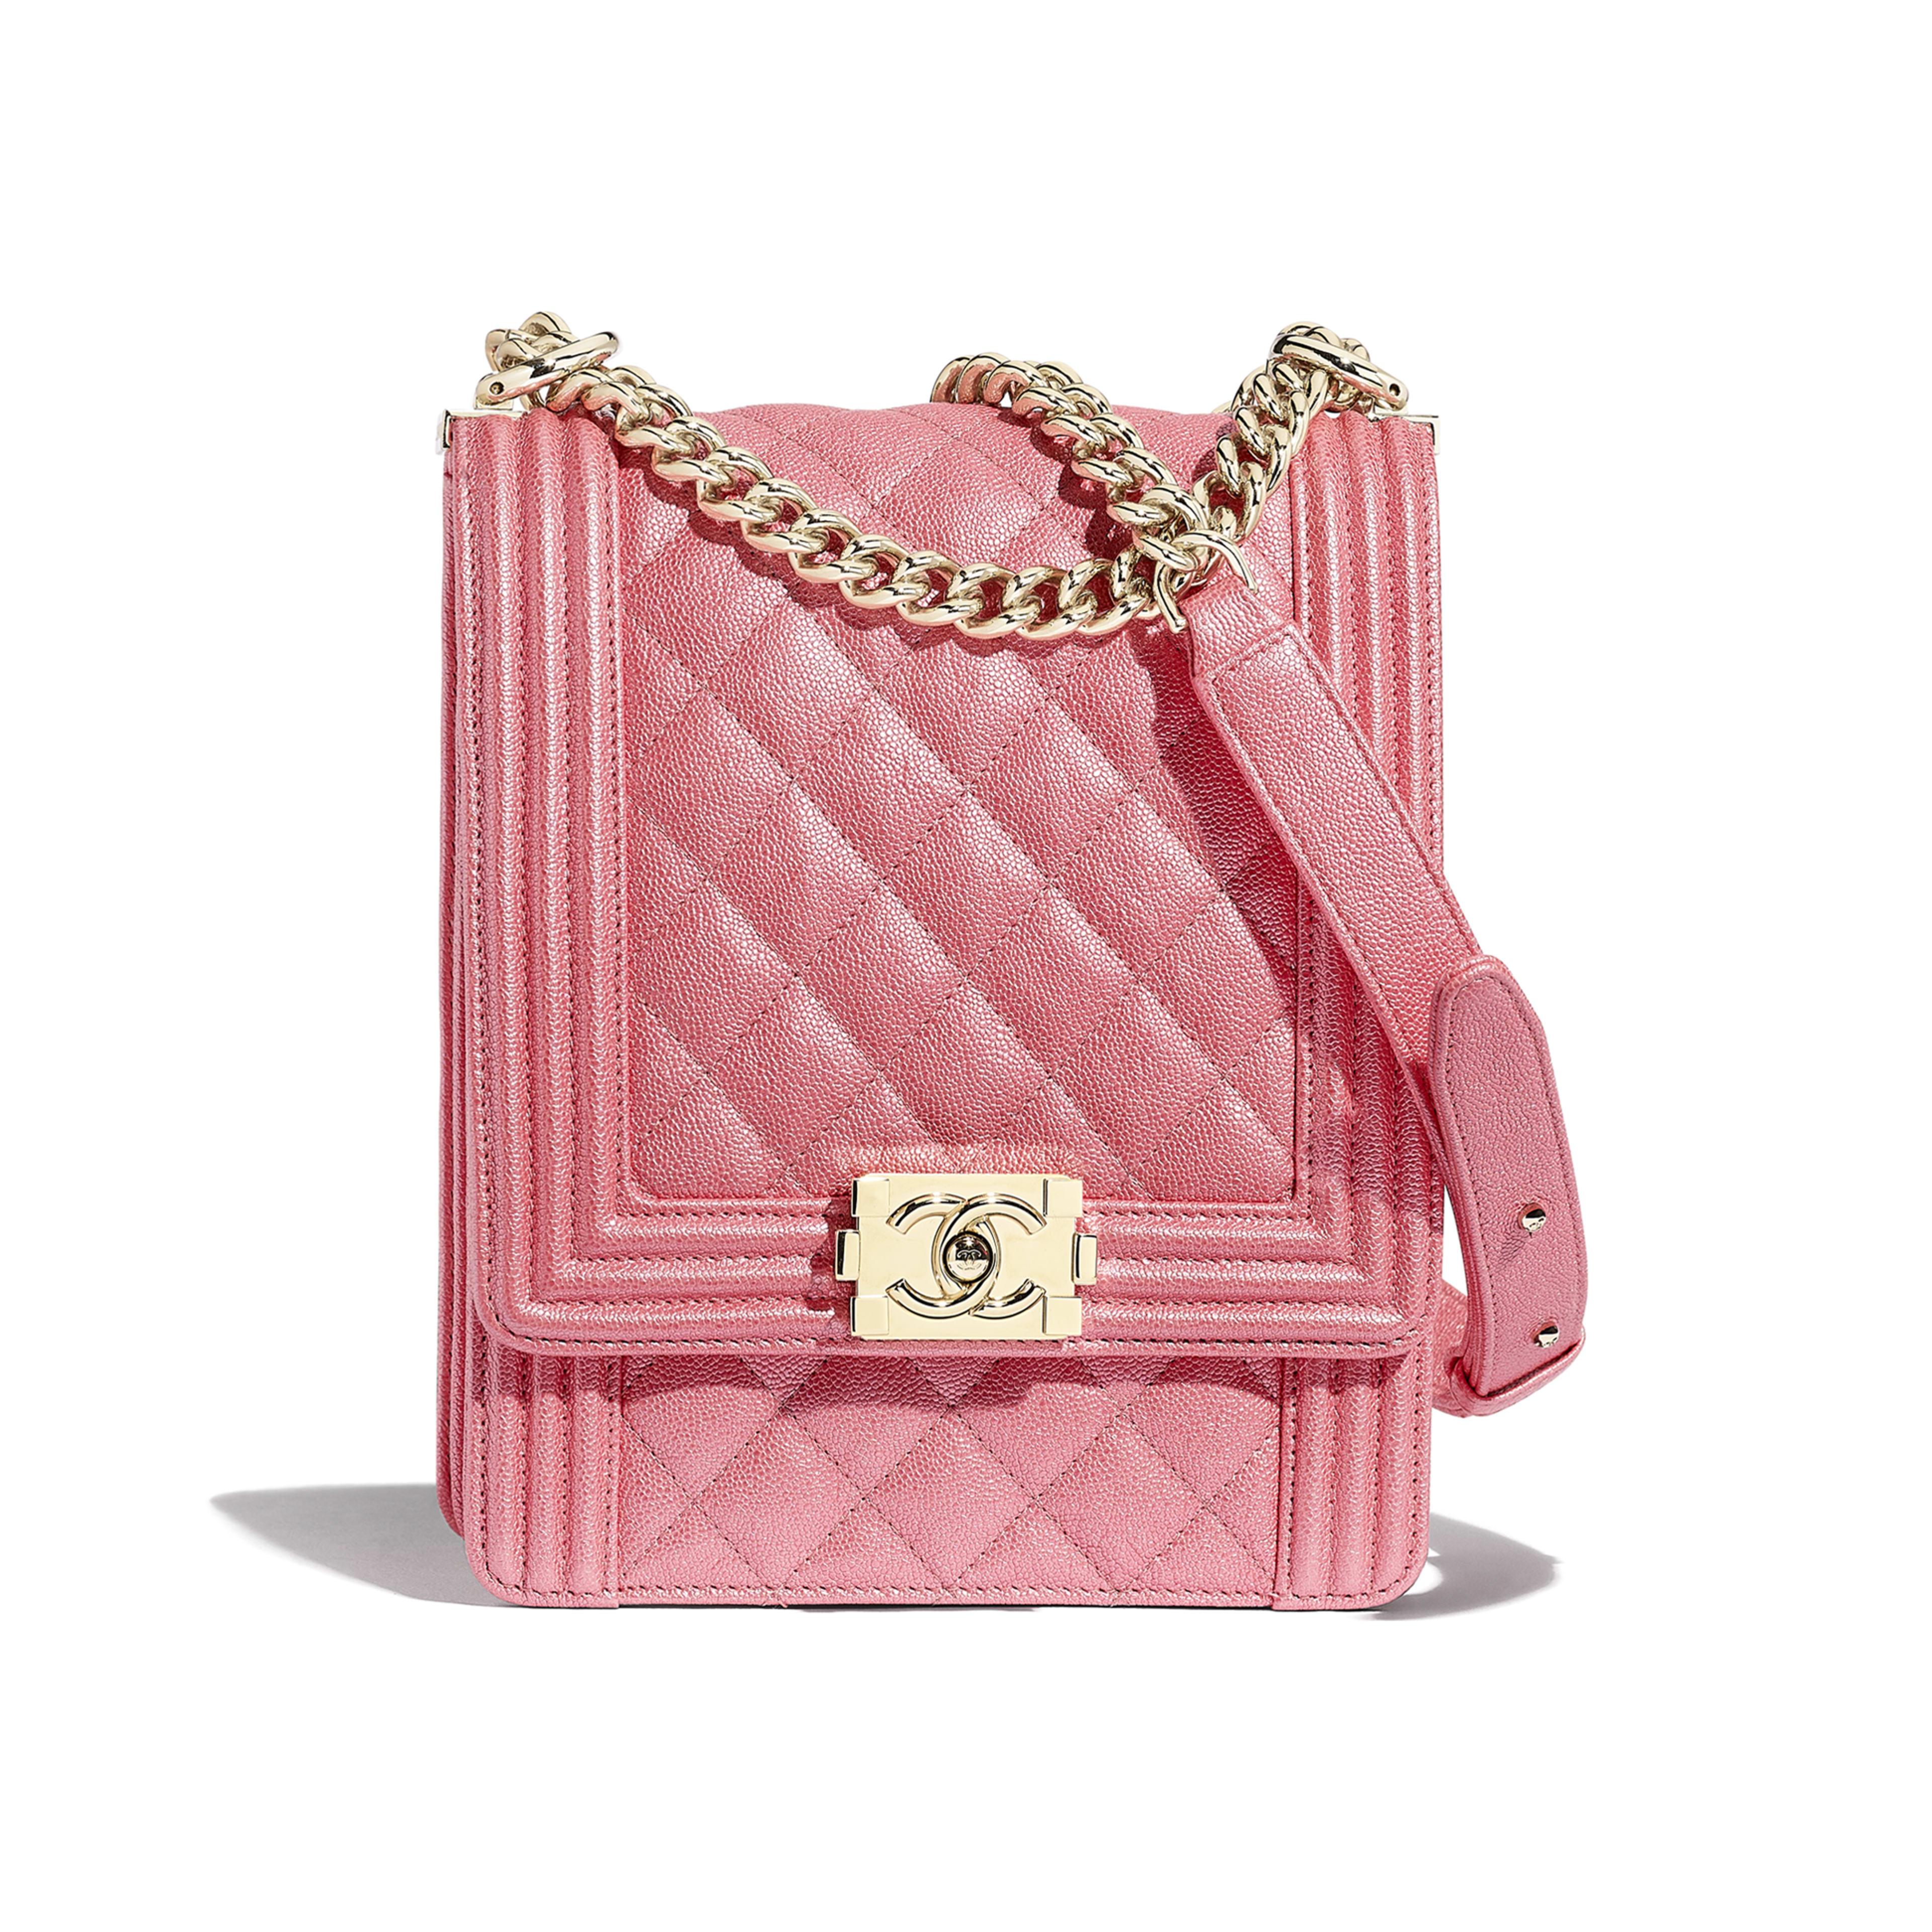 BOY CHANEL Handbag - Pink - Metallic Grained Calfskin & Gold-Tone Metal - Default view - see full sized version